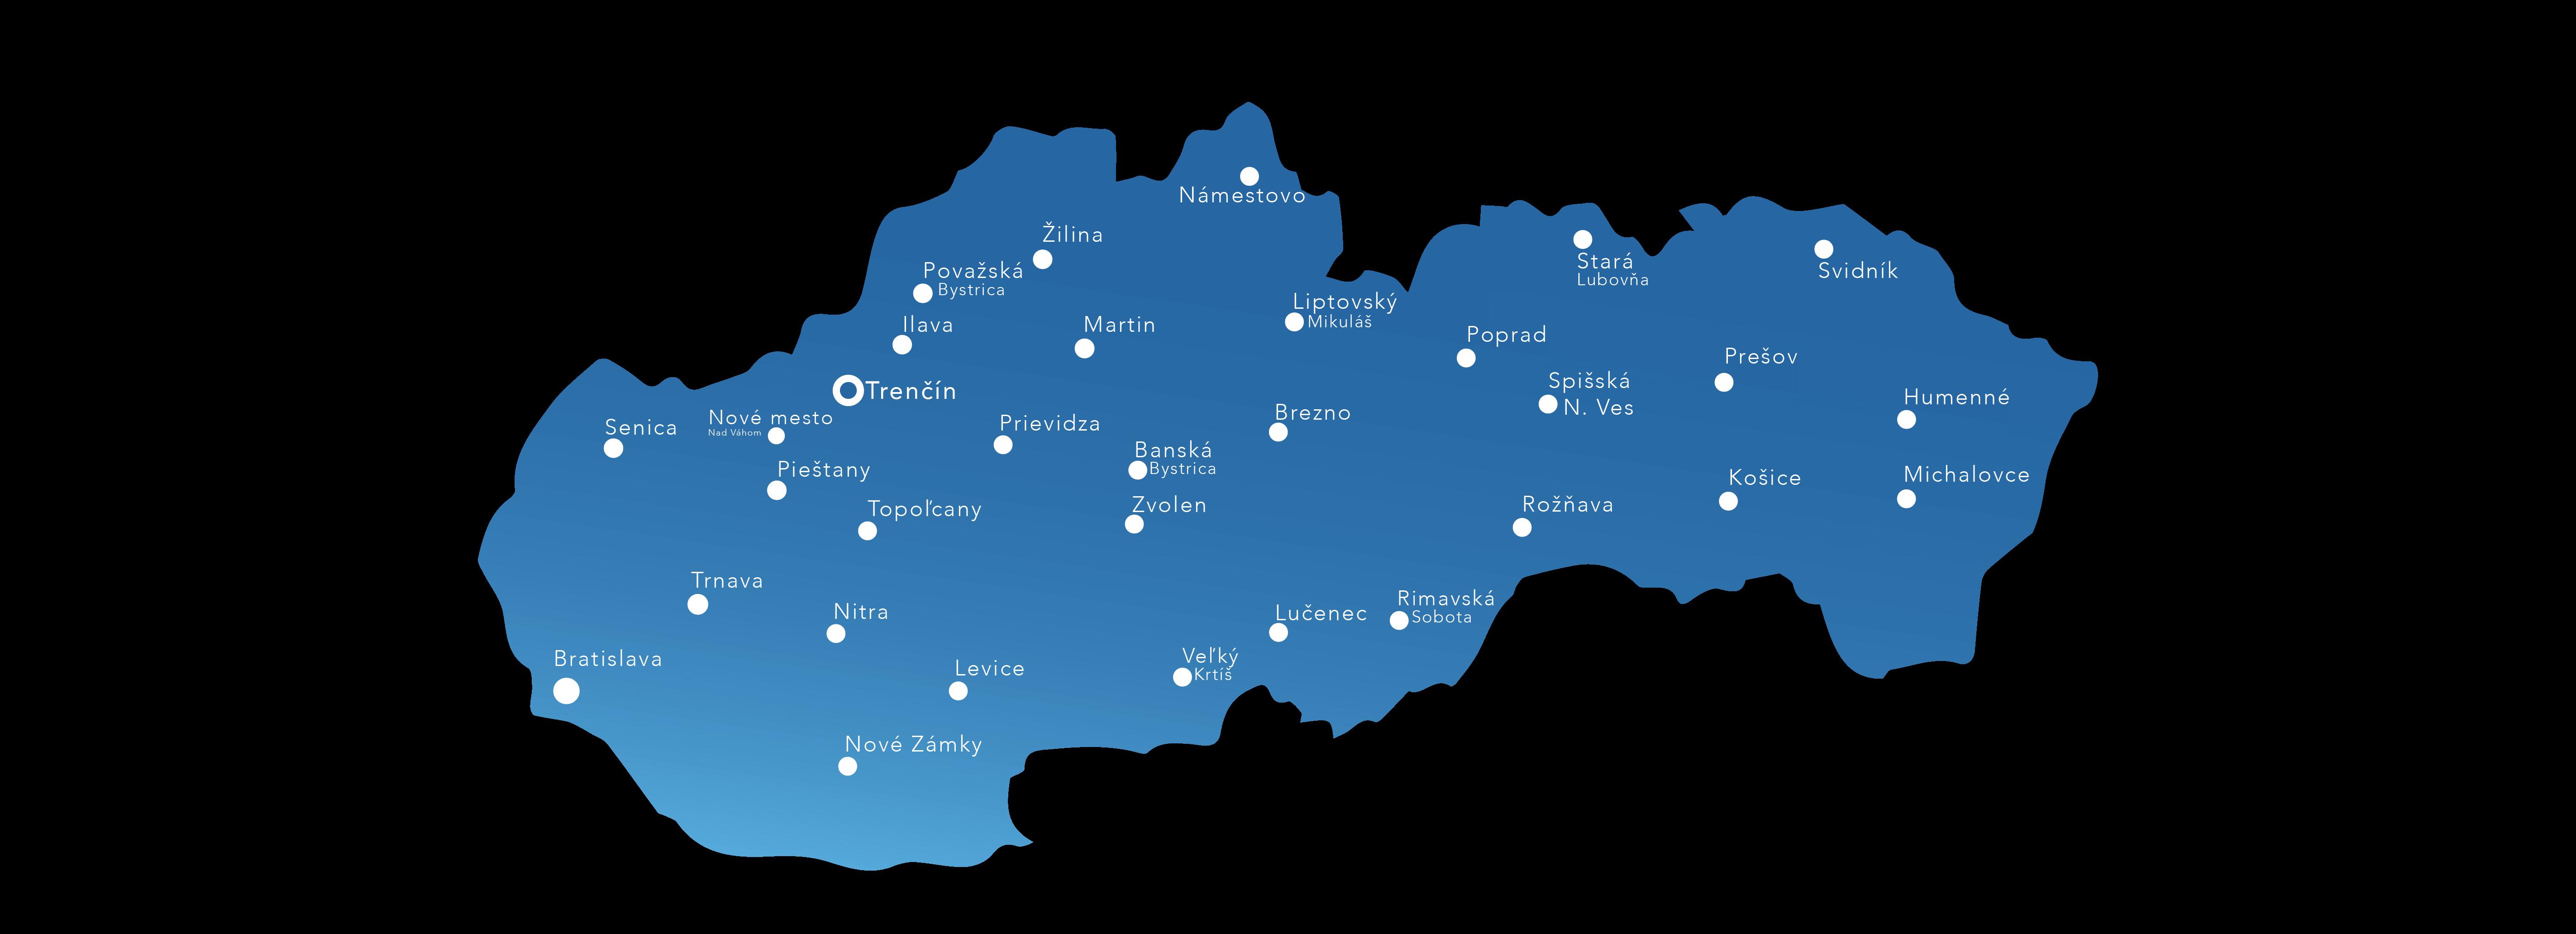 mapa_no_bacc-01 (1)